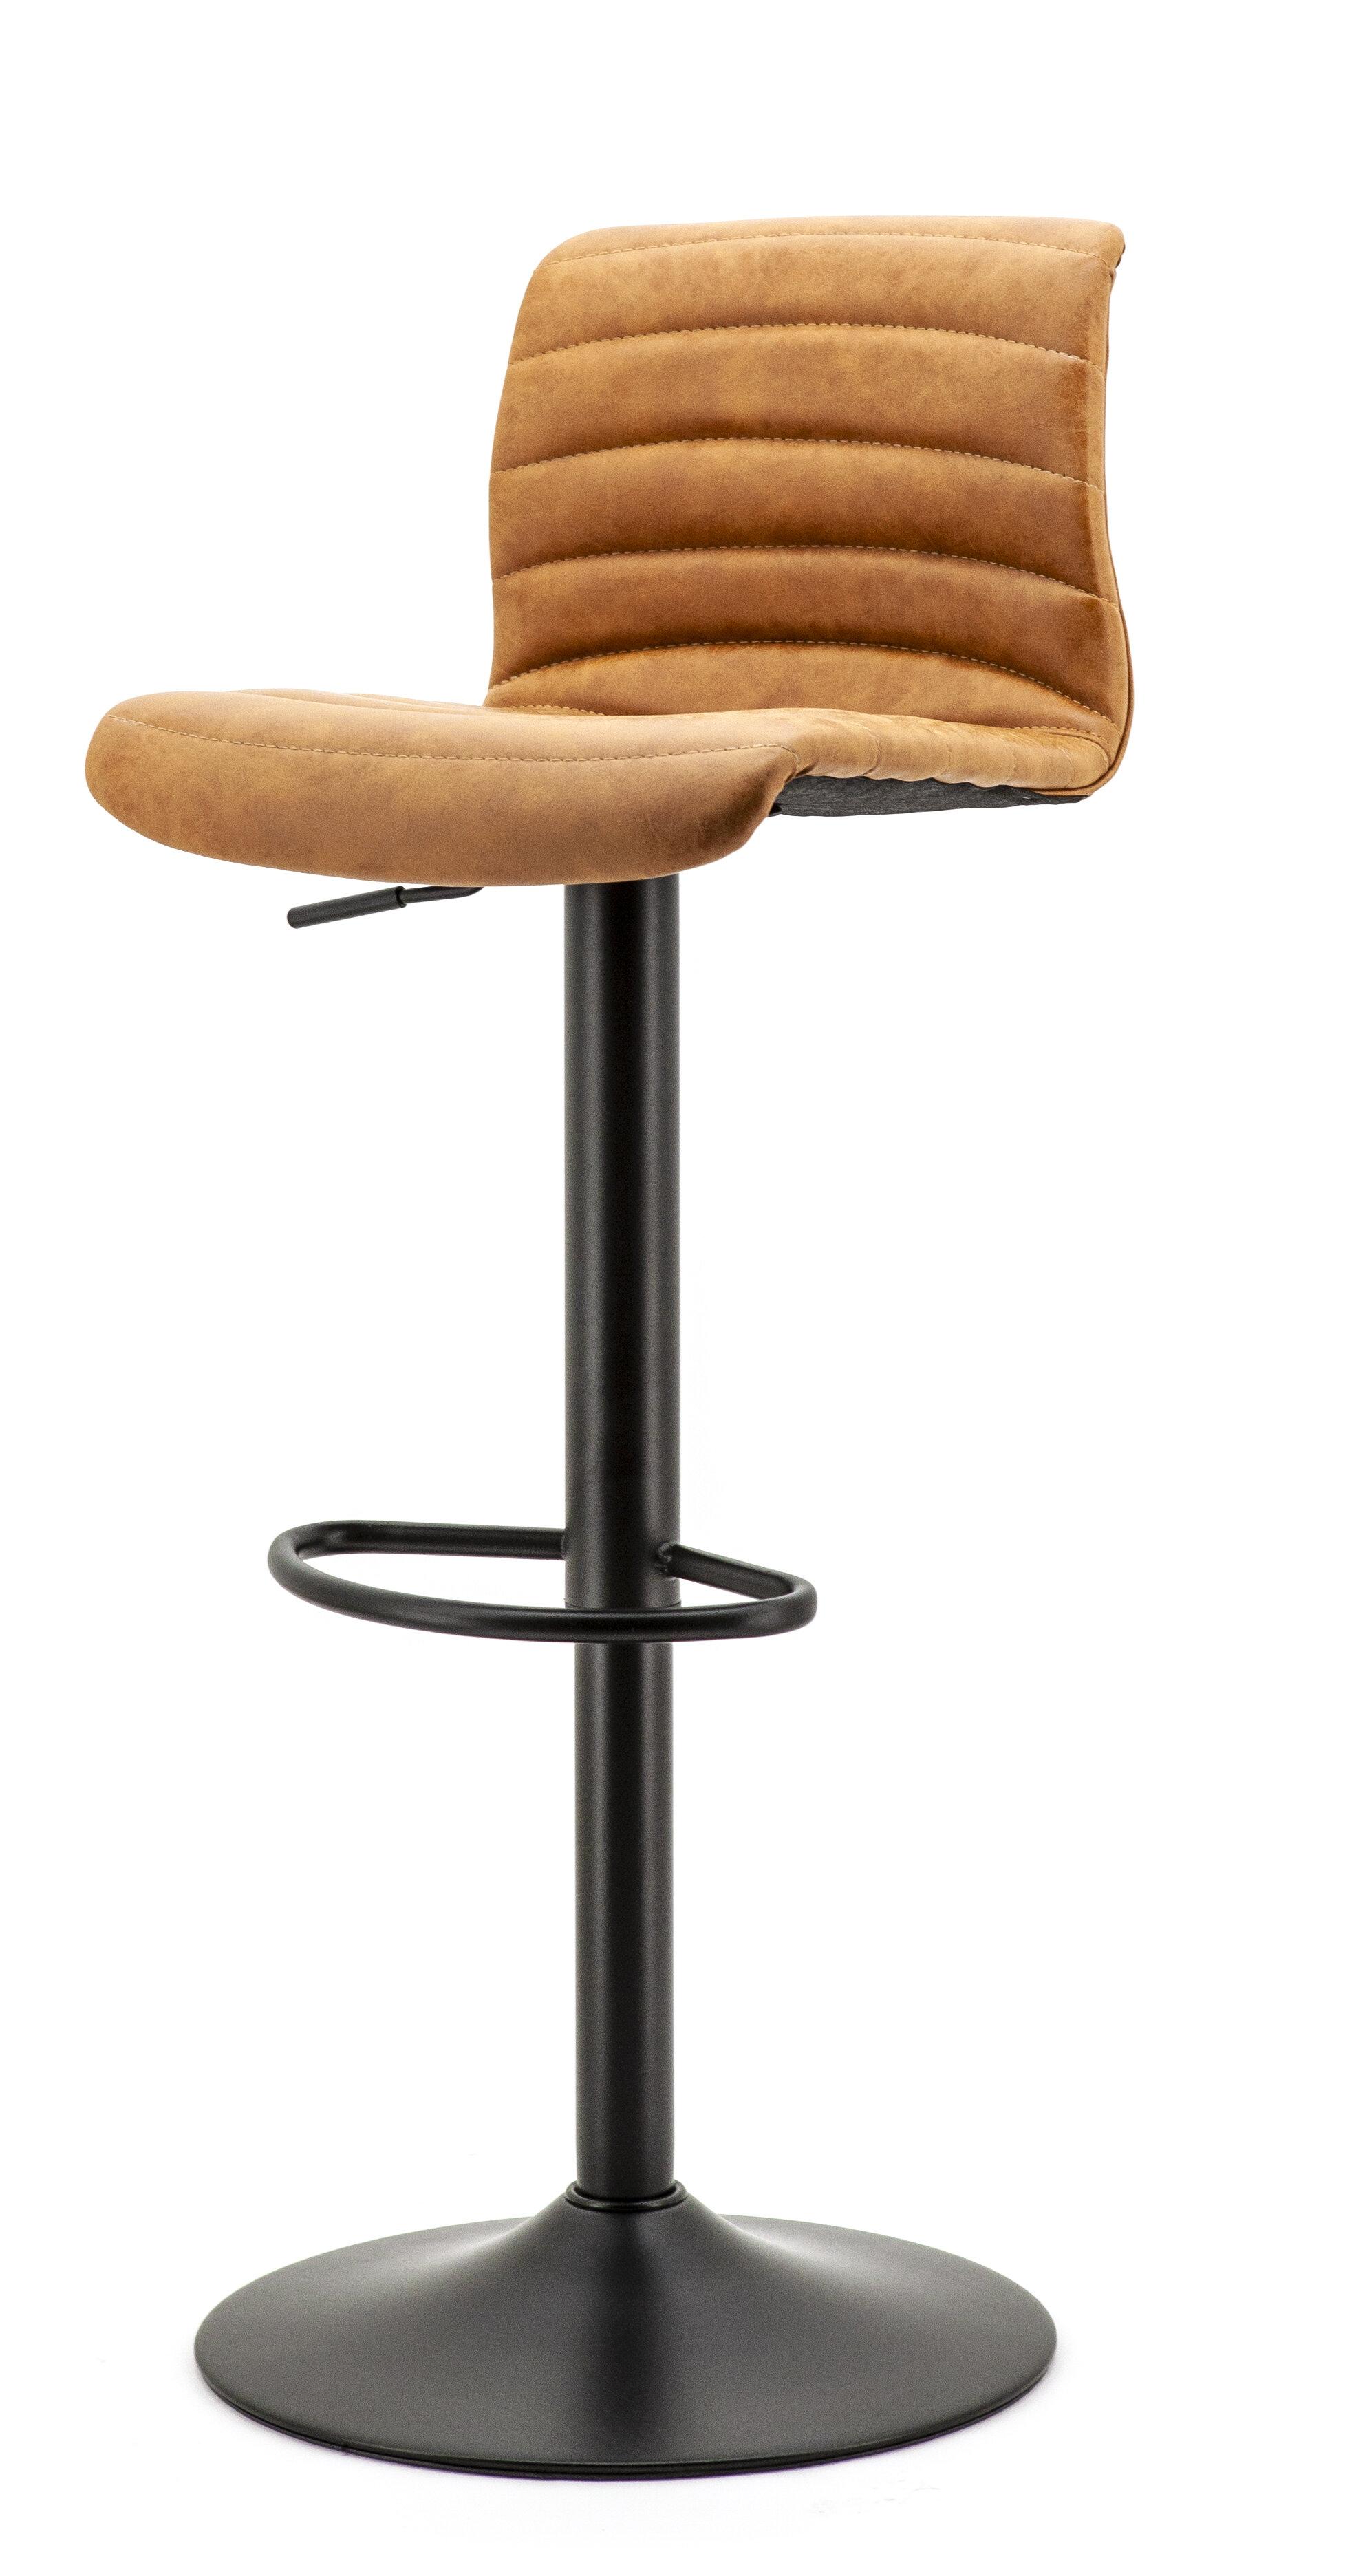 By Boo Spritzer Swivel Adjustable Height Bar Stool Wayfair